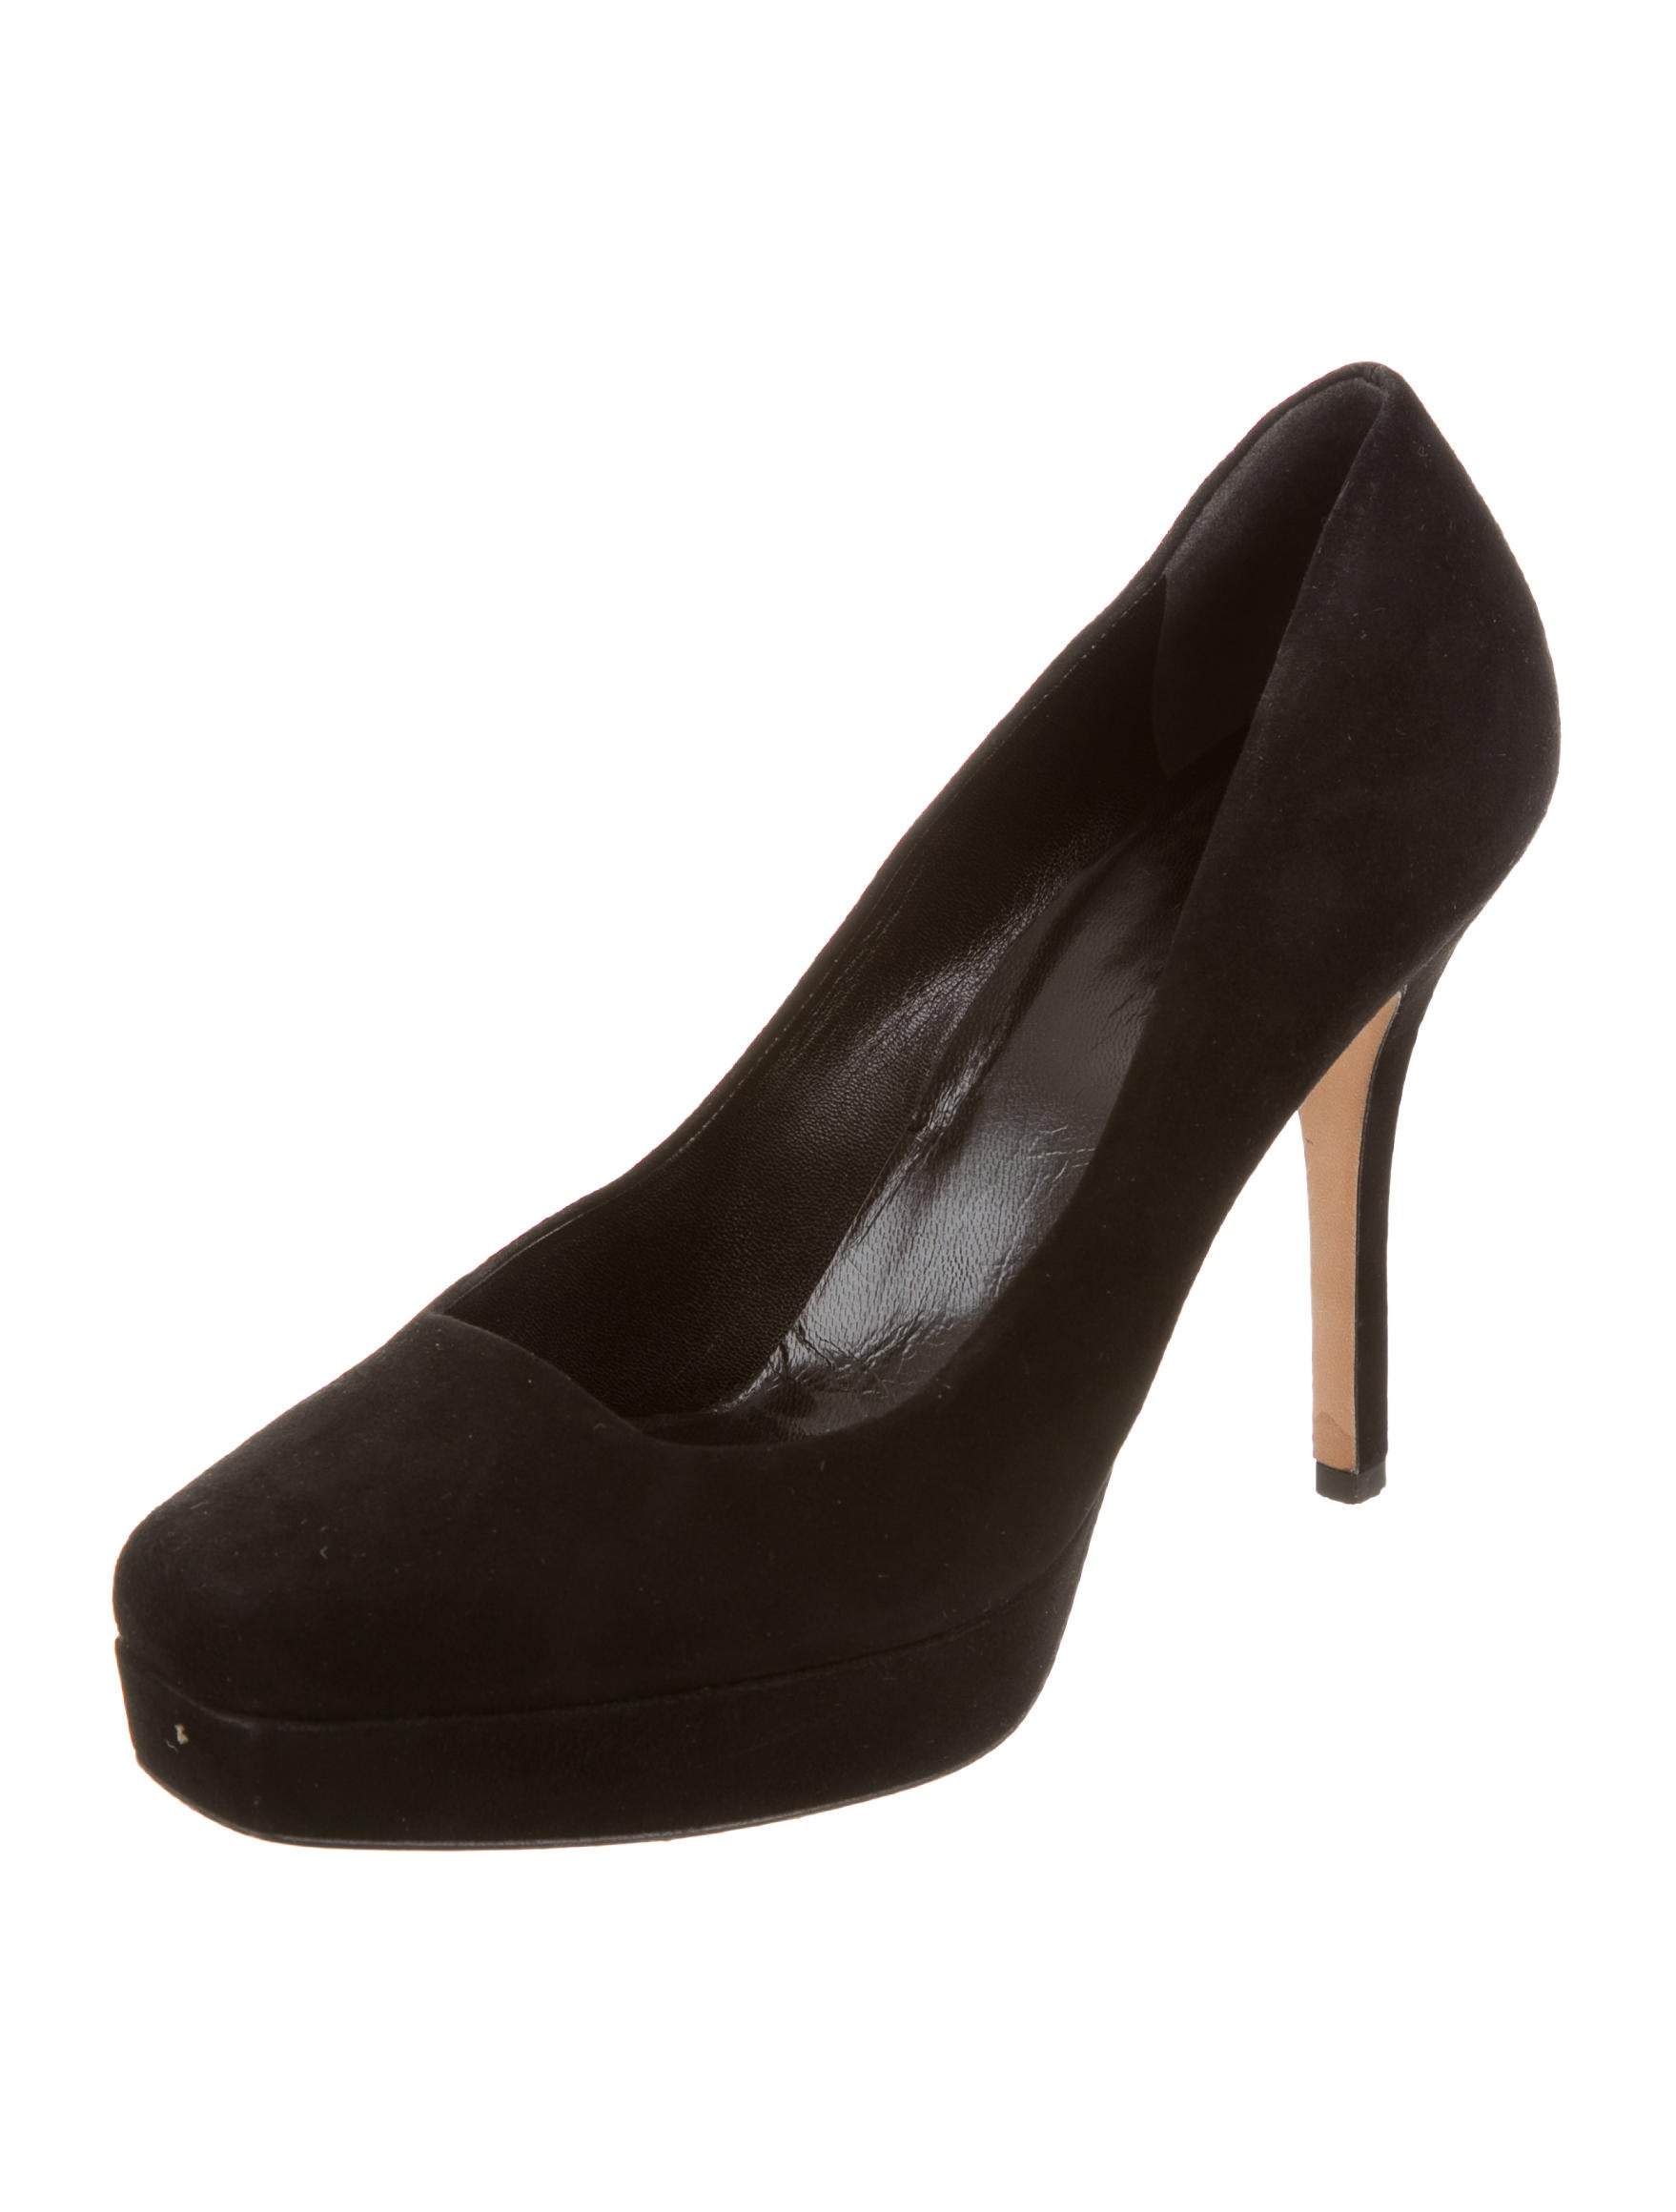 gucci suede platform pumps shoes guc106489 the realreal